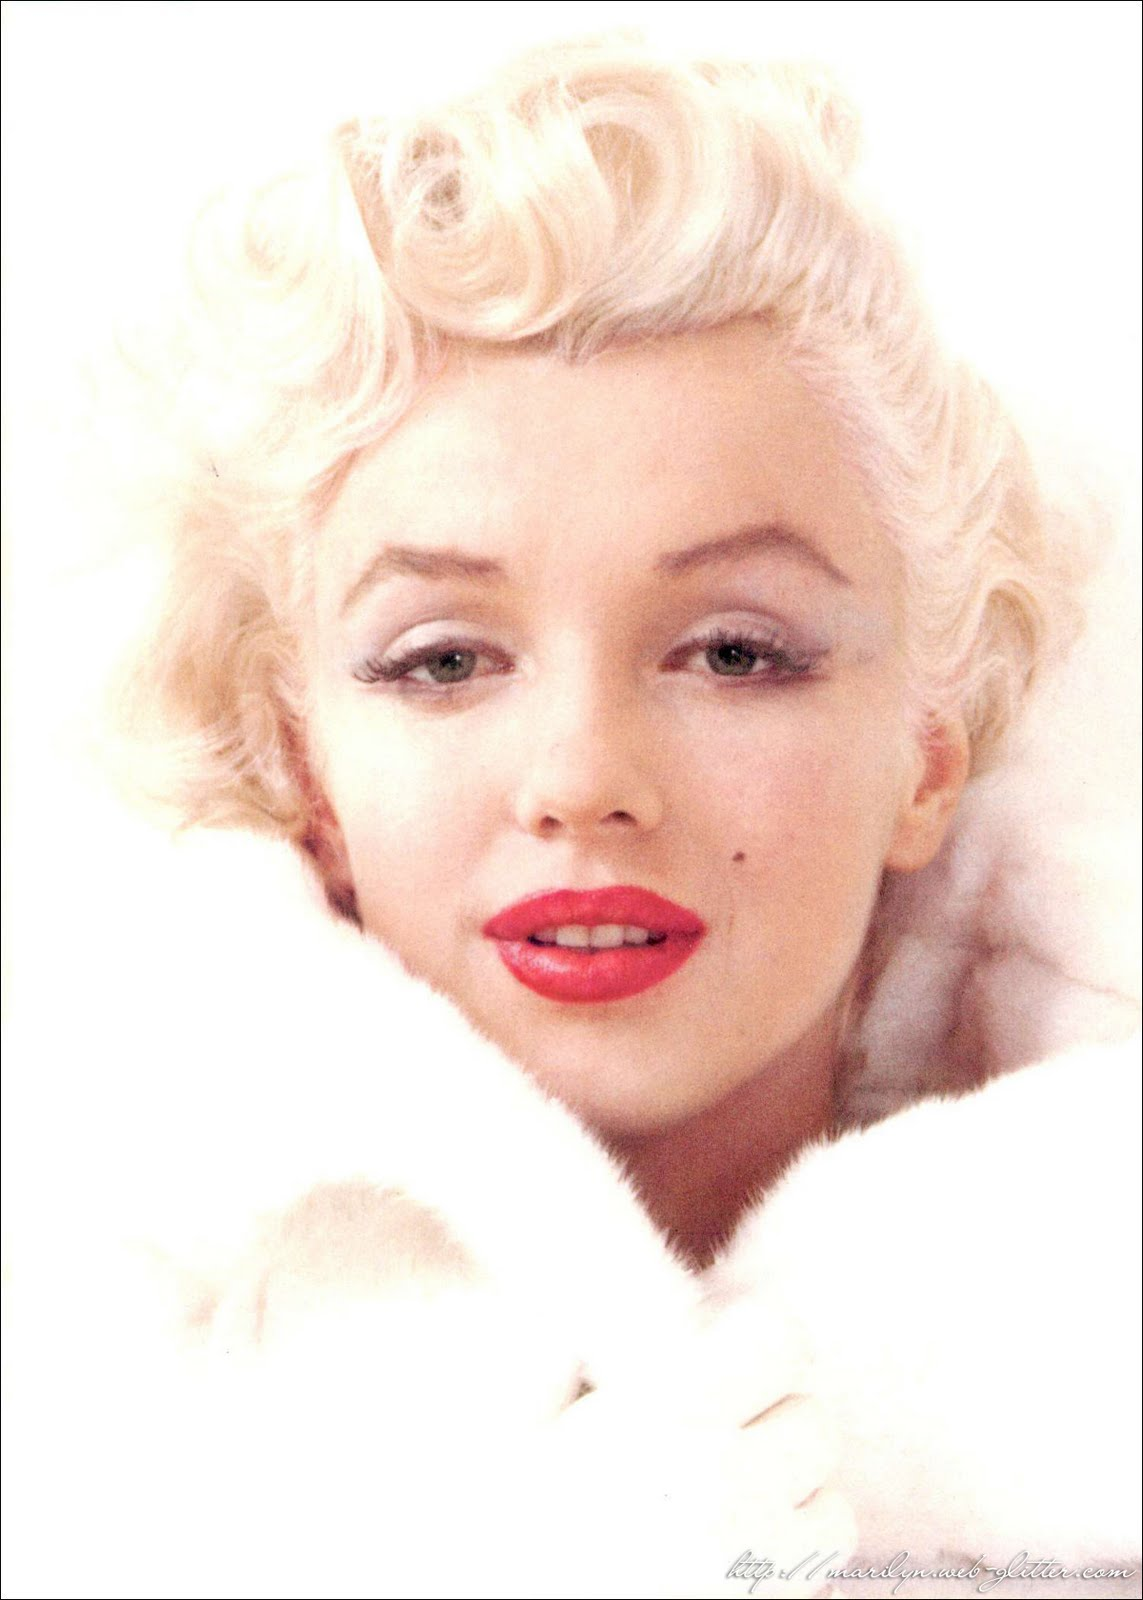 http://3.bp.blogspot.com/-j53ltcsUVo0/TdqhSOkKNpI/AAAAAAAAC8M/hhOL0dVzUQQ/s1600/Marilyn-Monroe-marilyn-monroe-12892550-1200-1680.jpg